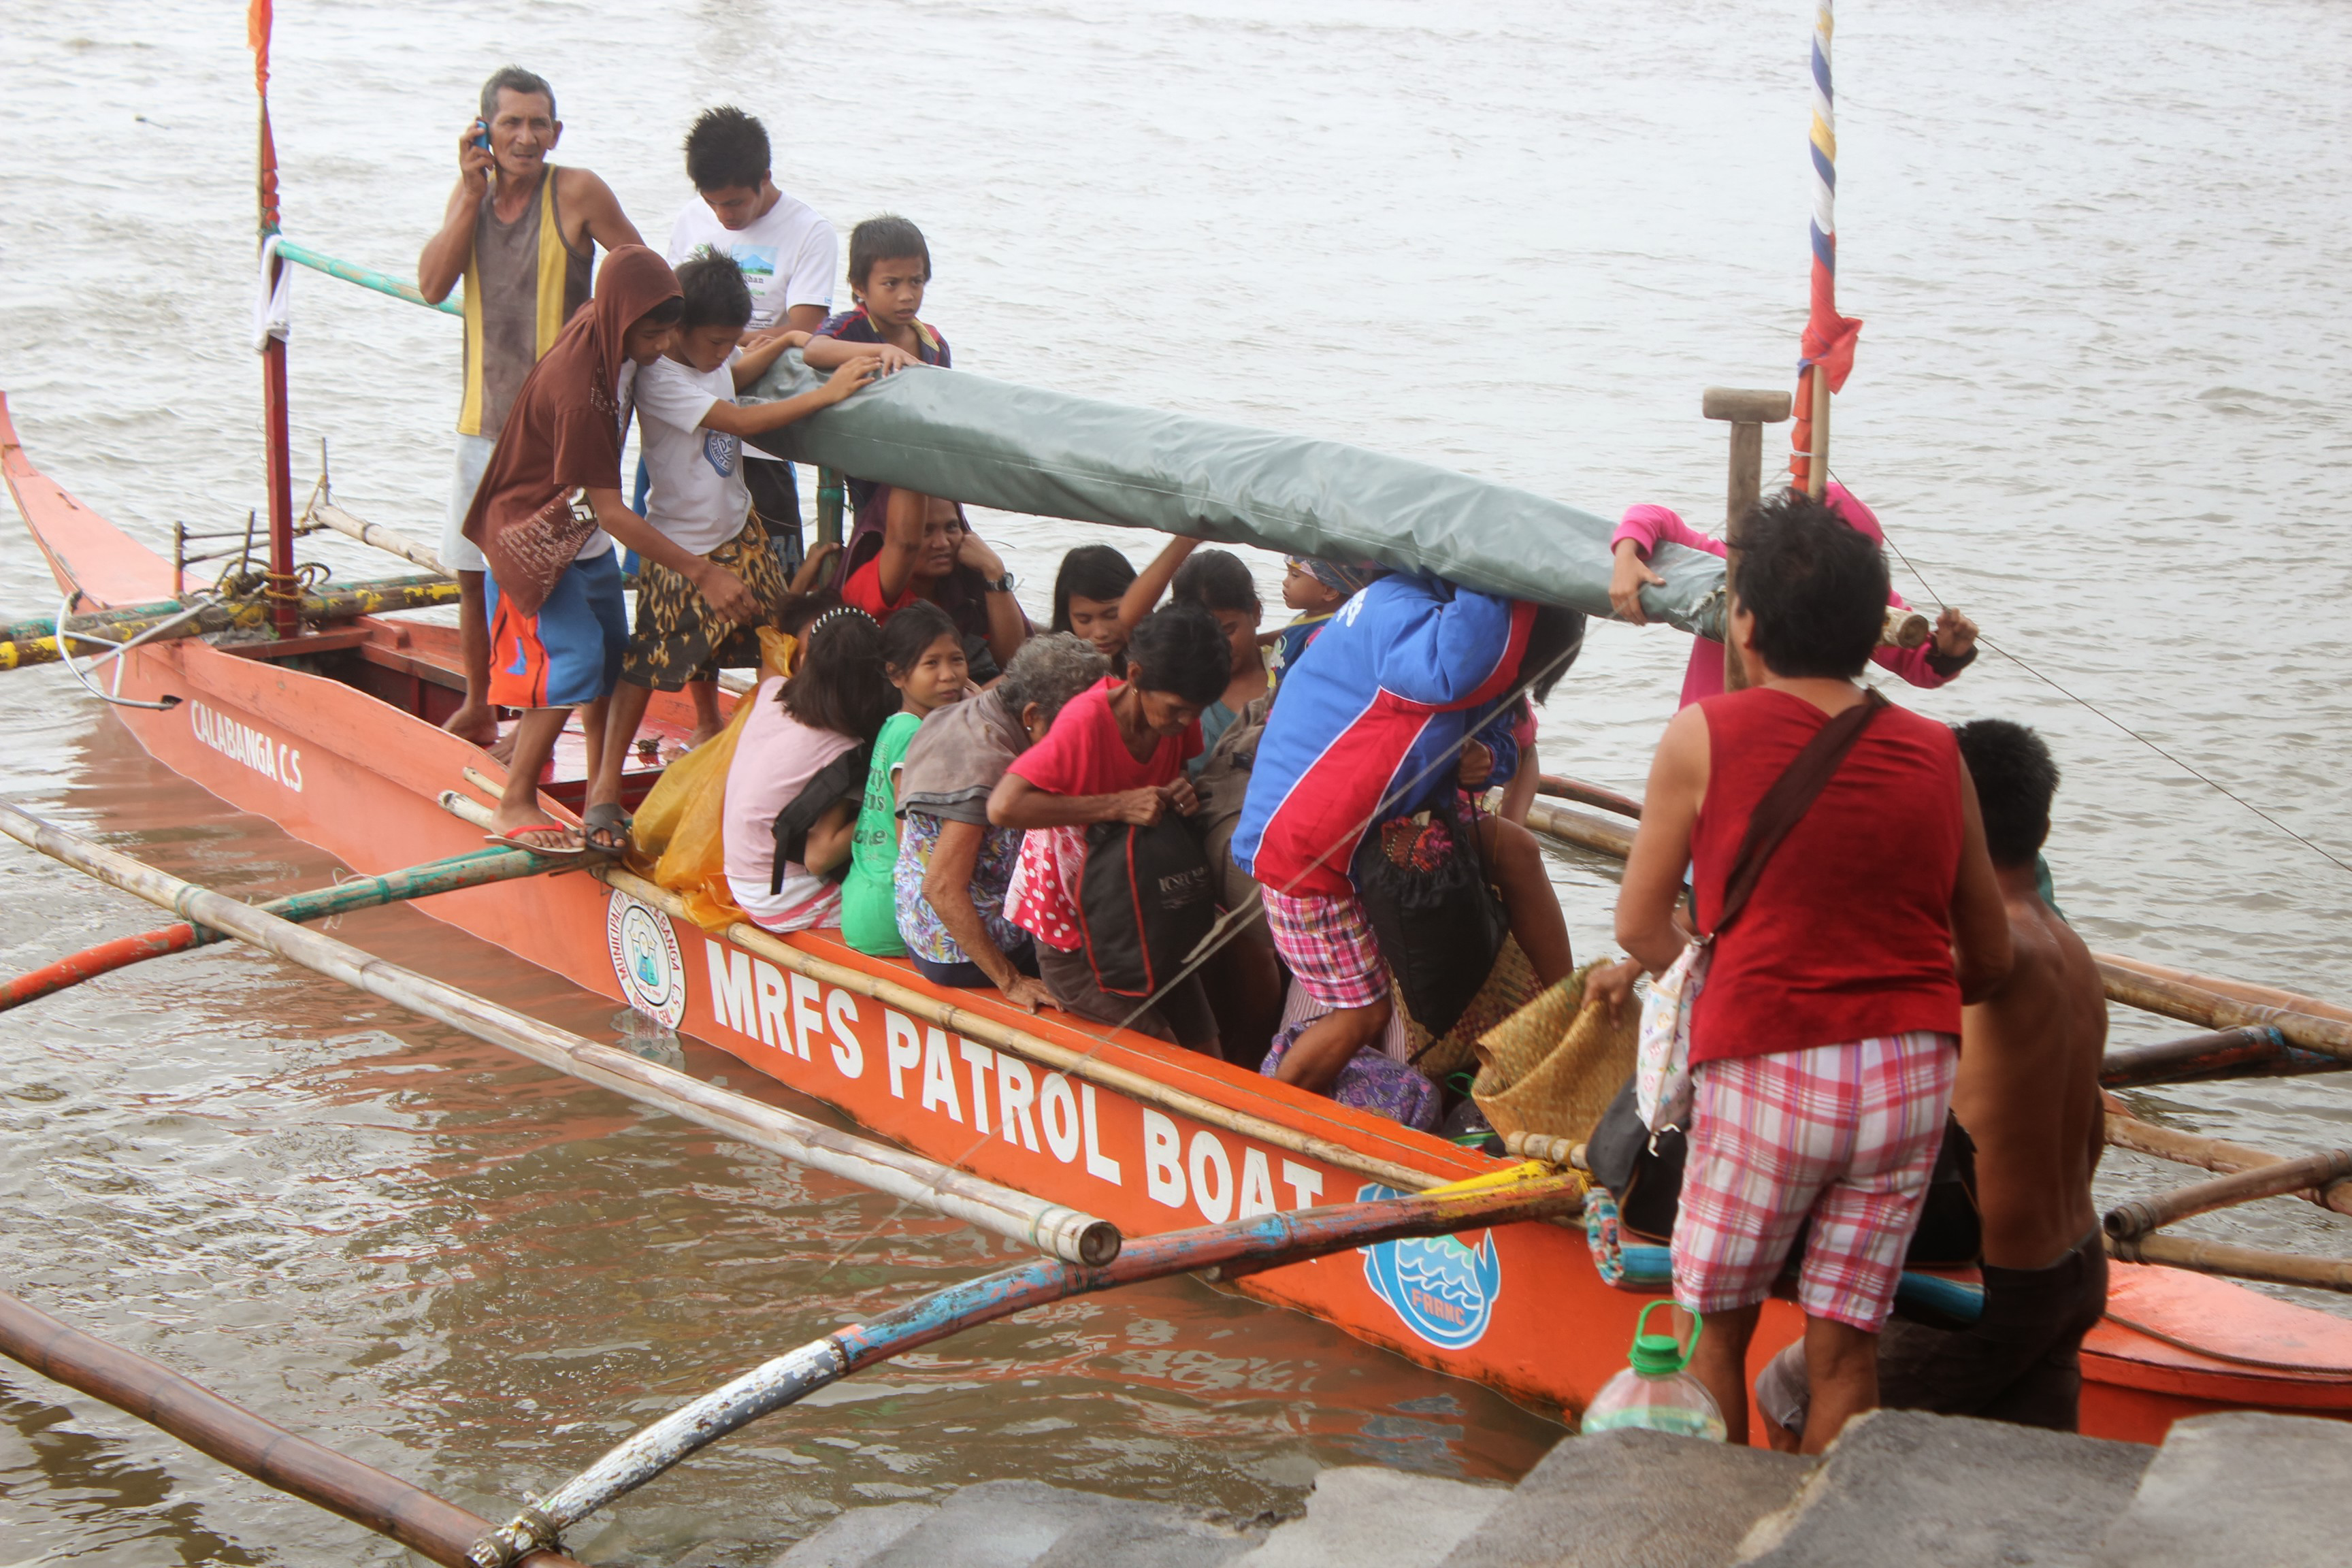 typhoonboat.jpg